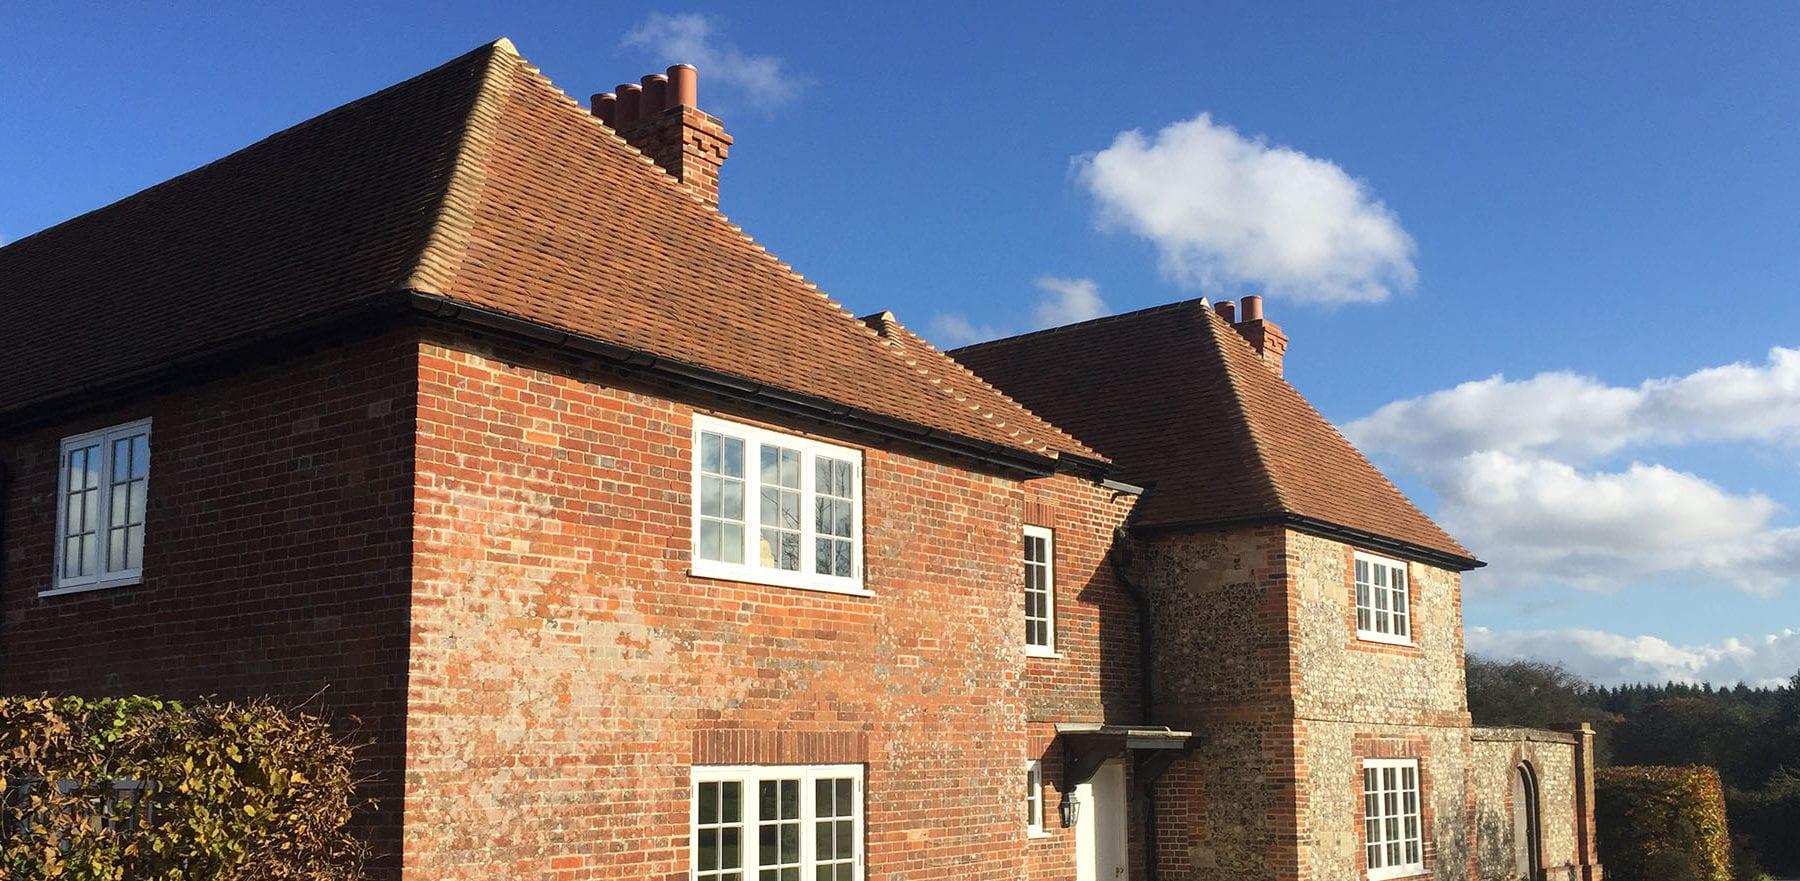 Lifestiles - Handmade Heather Clay Roof Tiles - Barlow, England 5